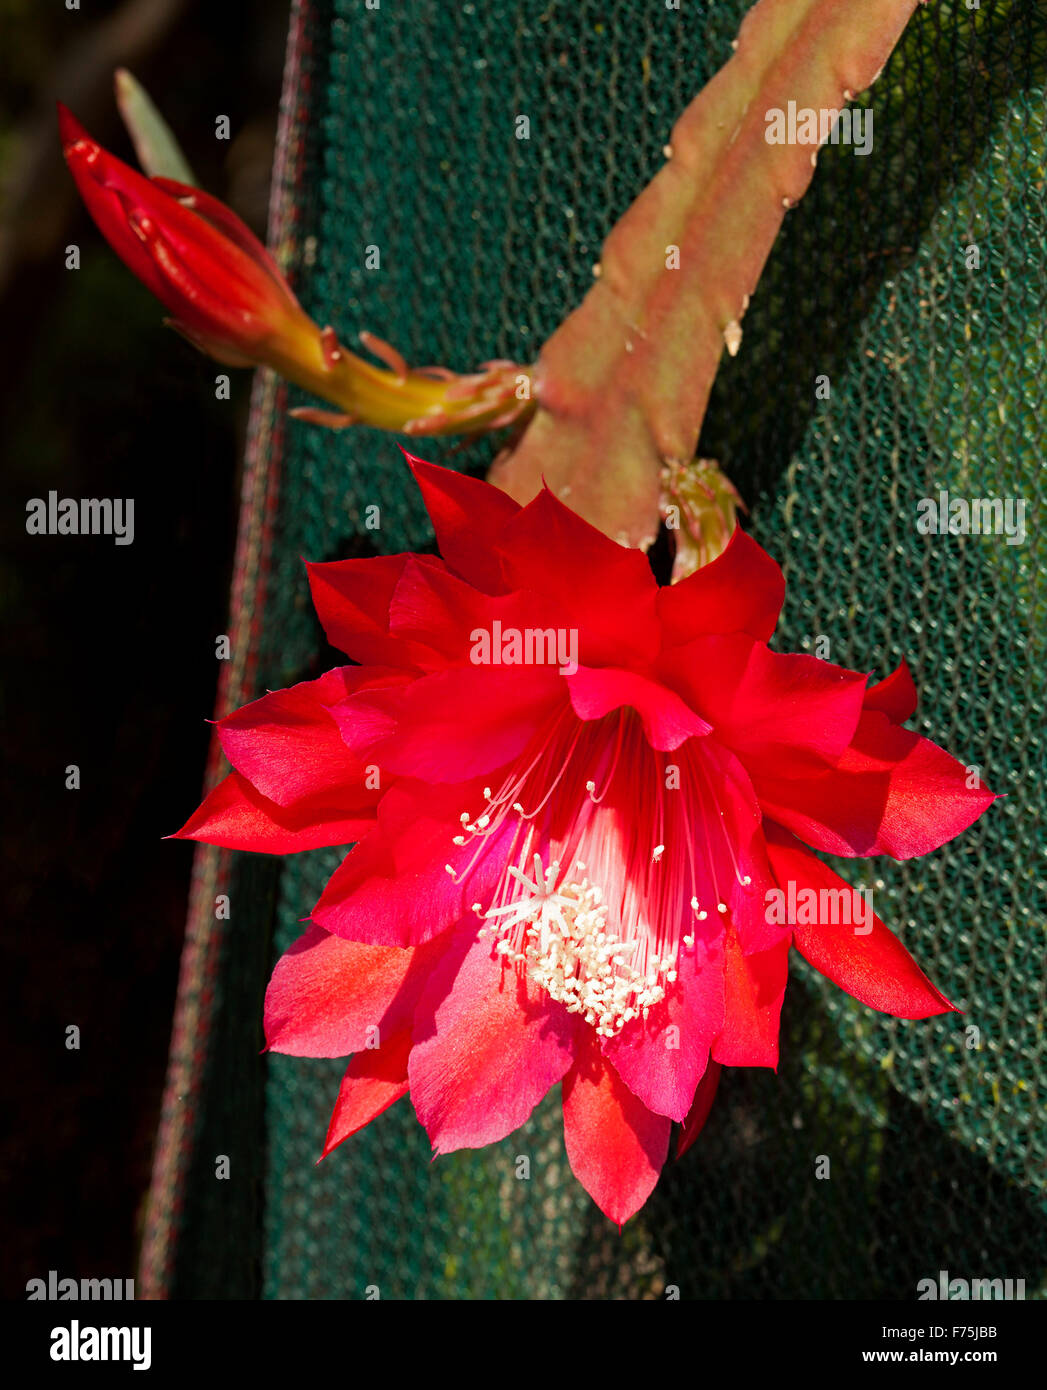 Spectacular Large Vivid Red Flower Bud Of Epiphyllum Cactus